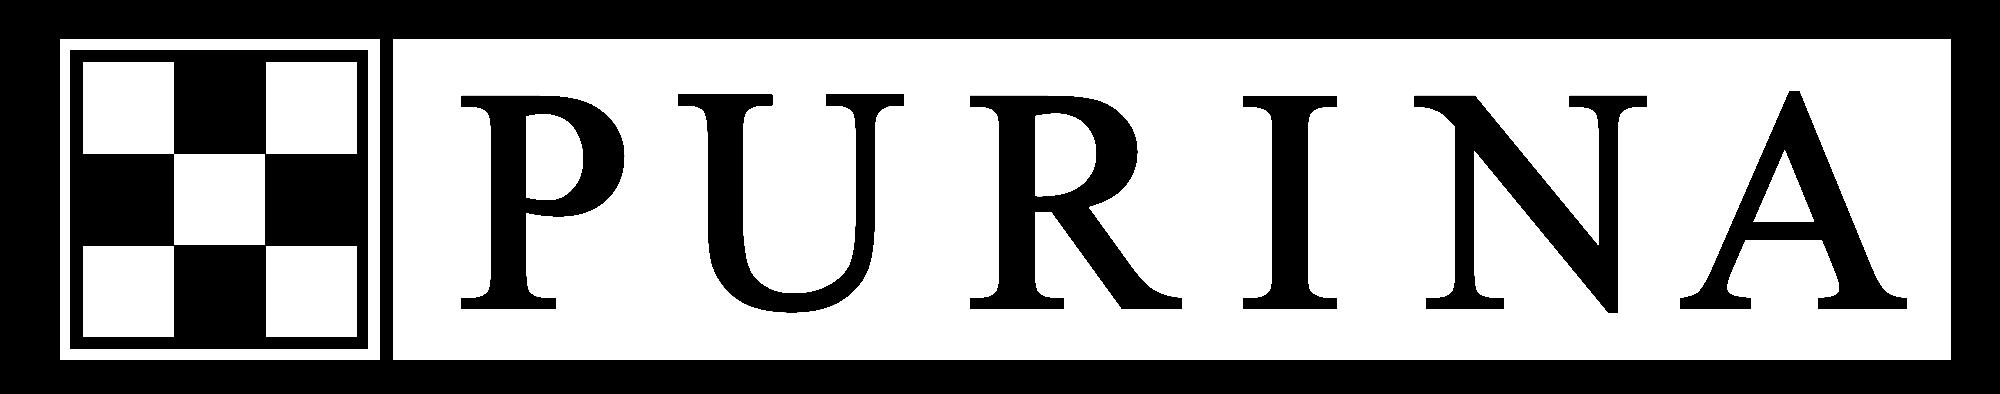 Purina-logo bw.png